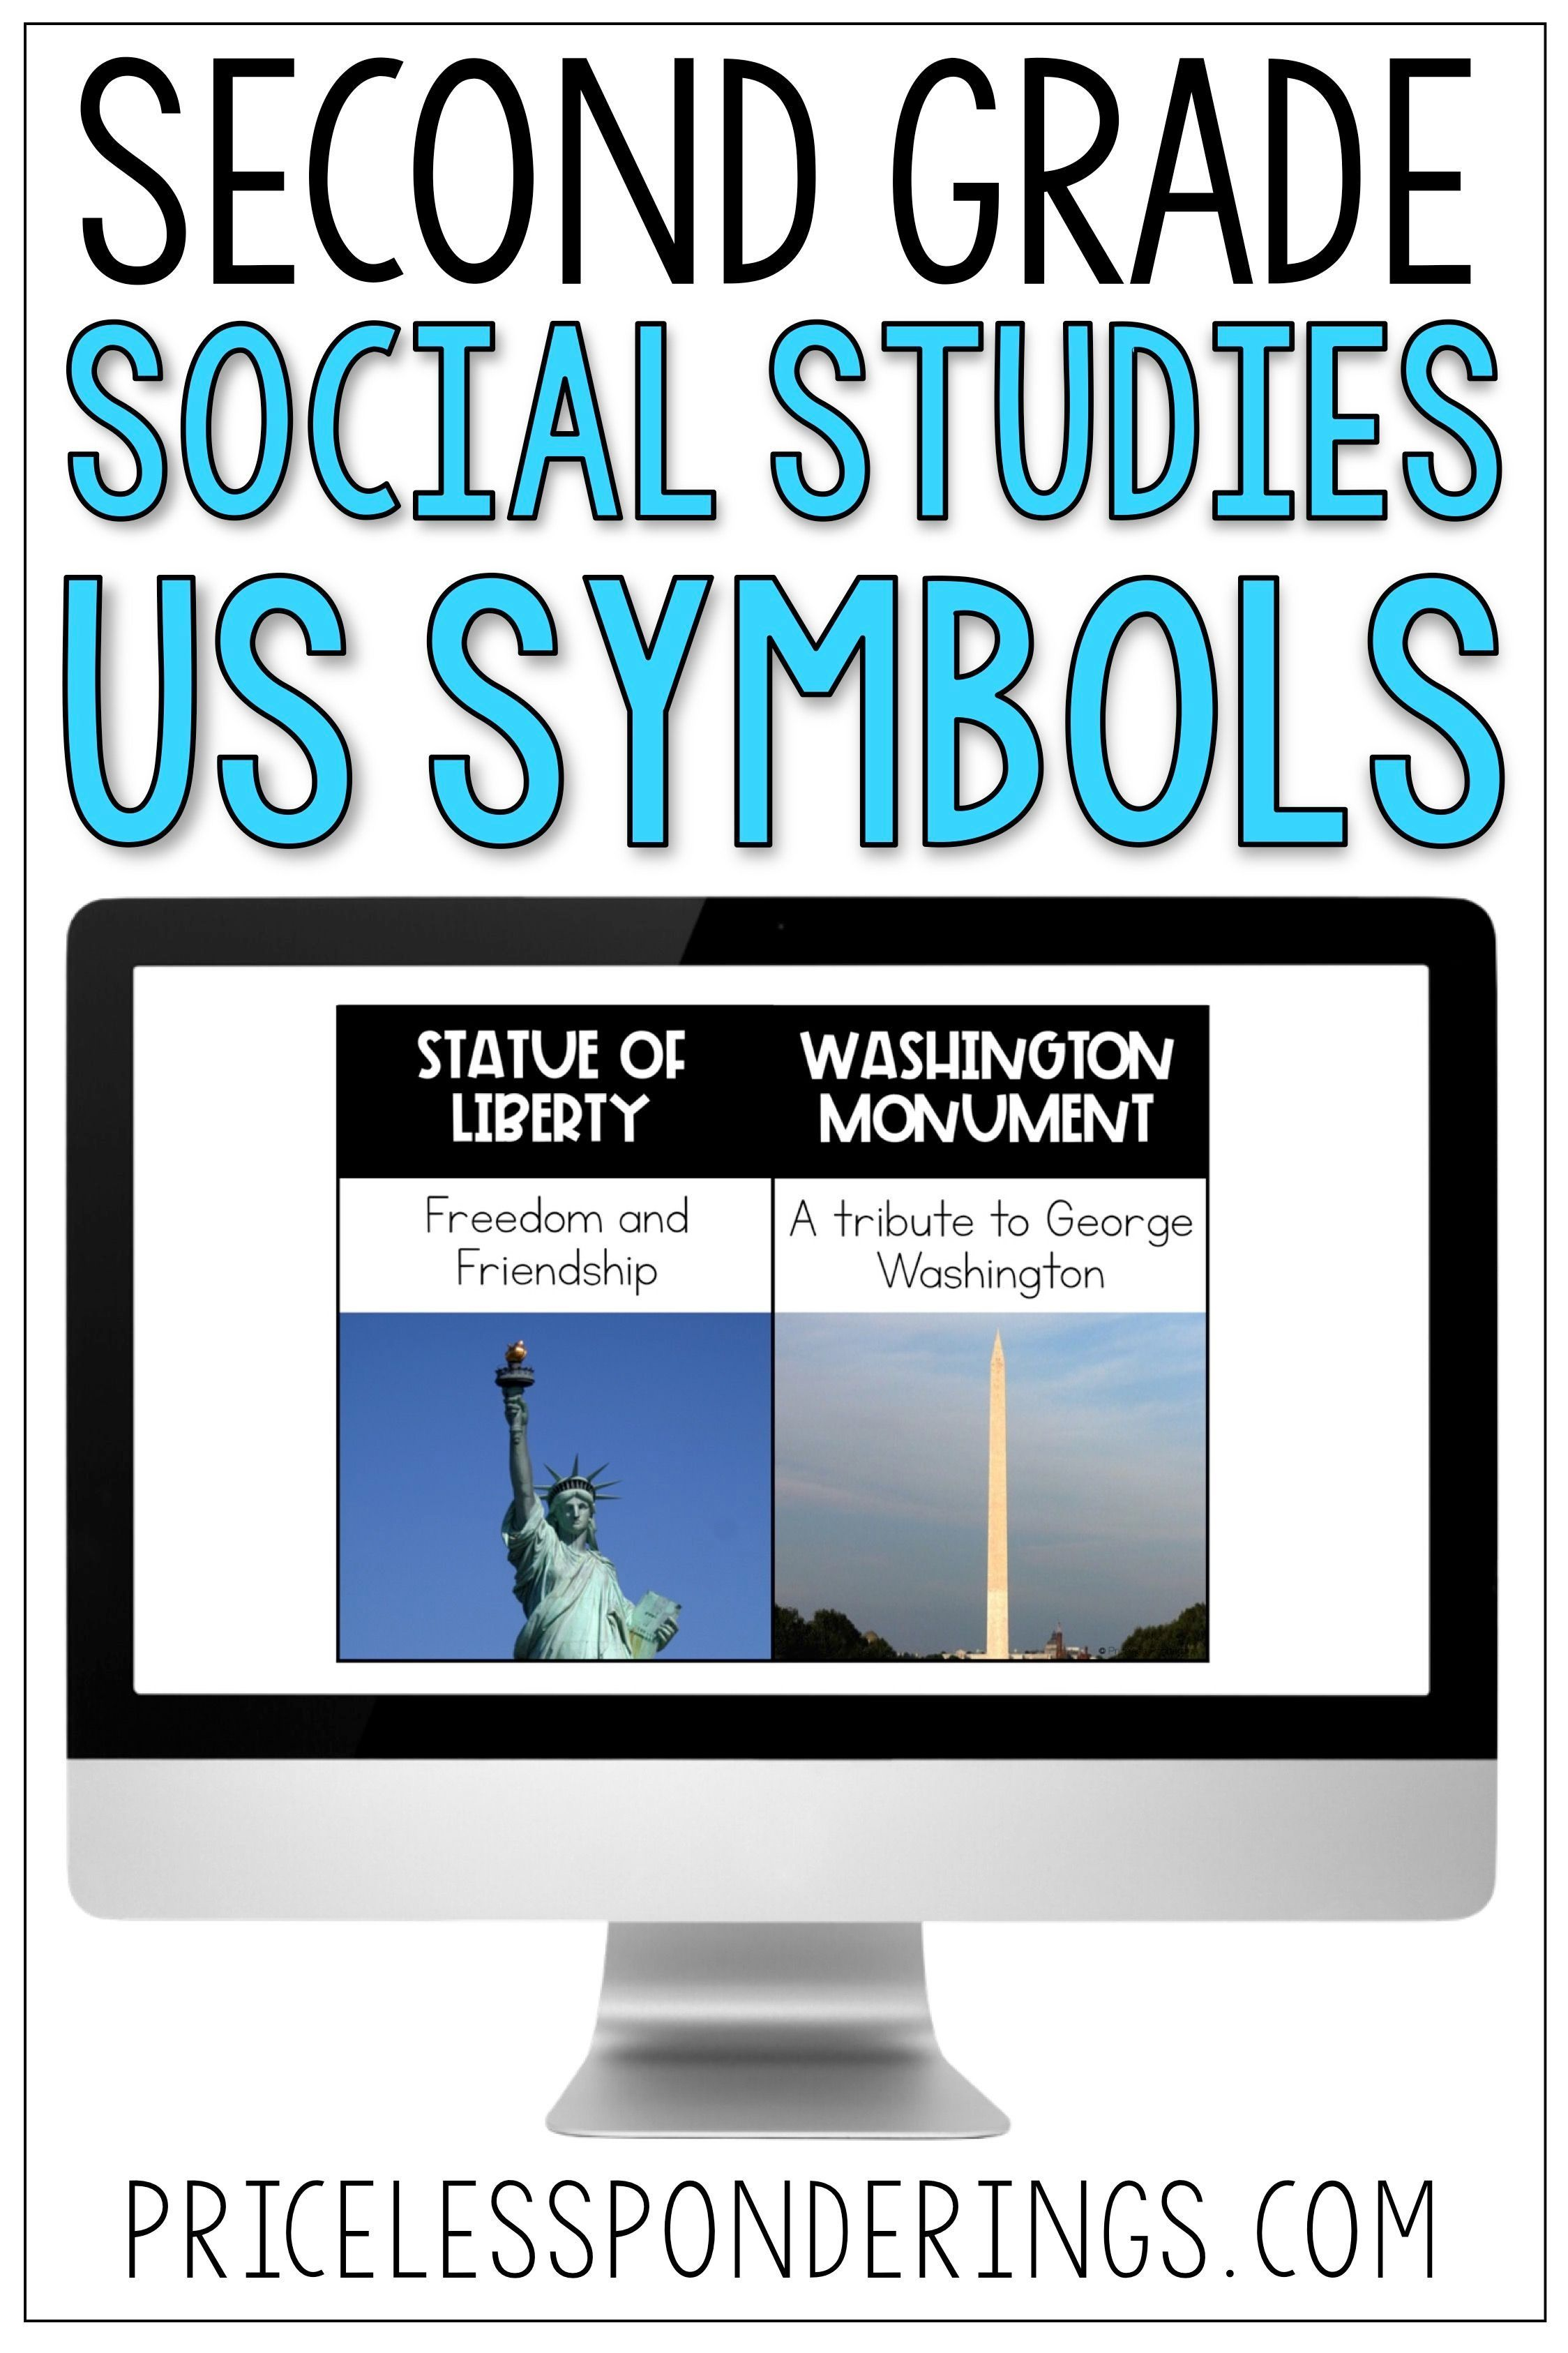 380 First Grade Social Studies Ideas In 2021 Social Studies Social Studies Elementary Interactive Notebooks Social Studies